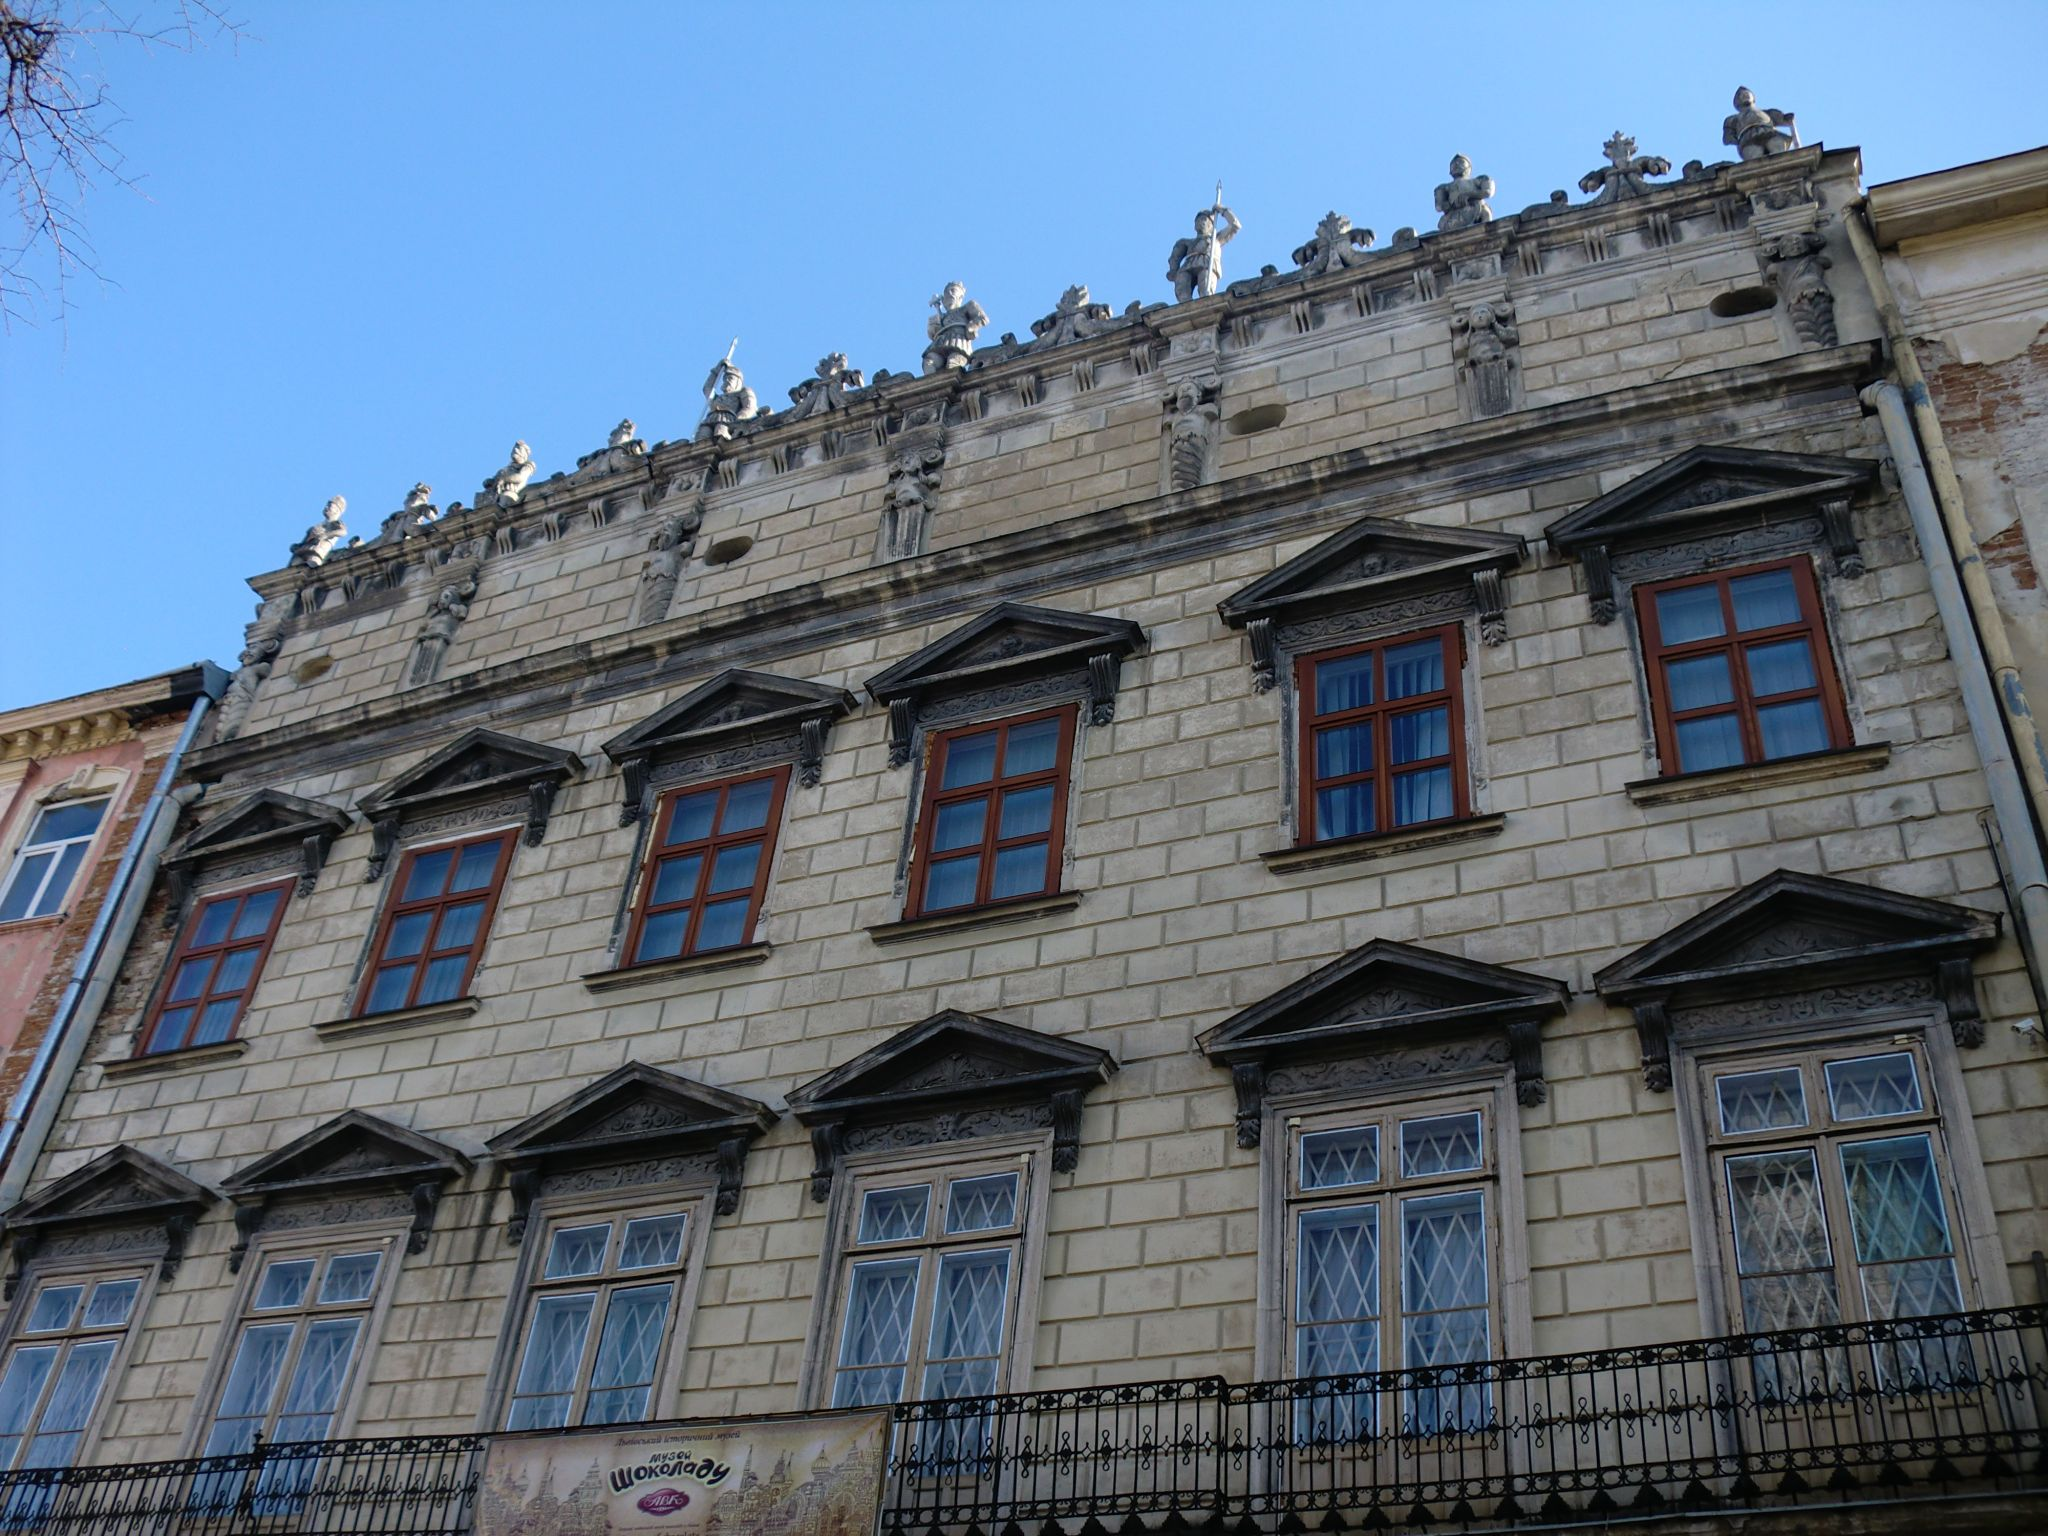 Lviv 24 - Lviv, the Ukrainian pearl